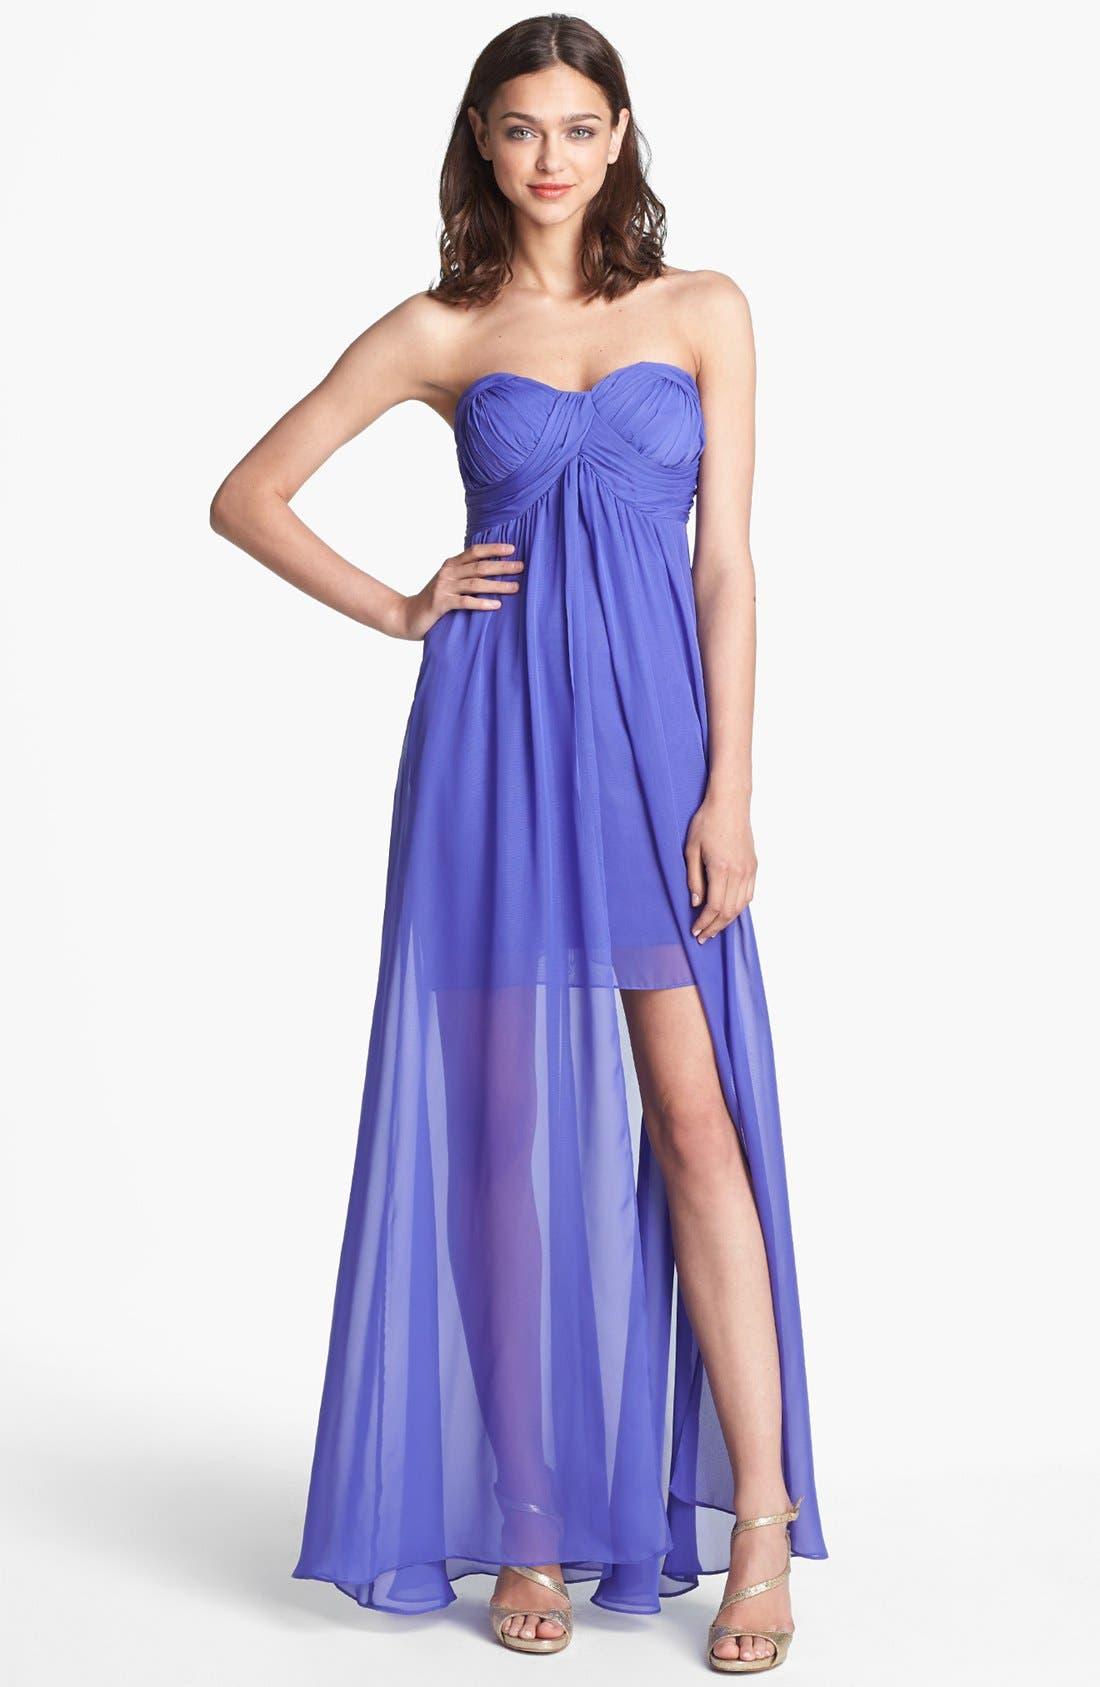 HAILEY BY ADRIANNA PAPELL, Flyaway Chiffon Dress, Main thumbnail 1, color, 513